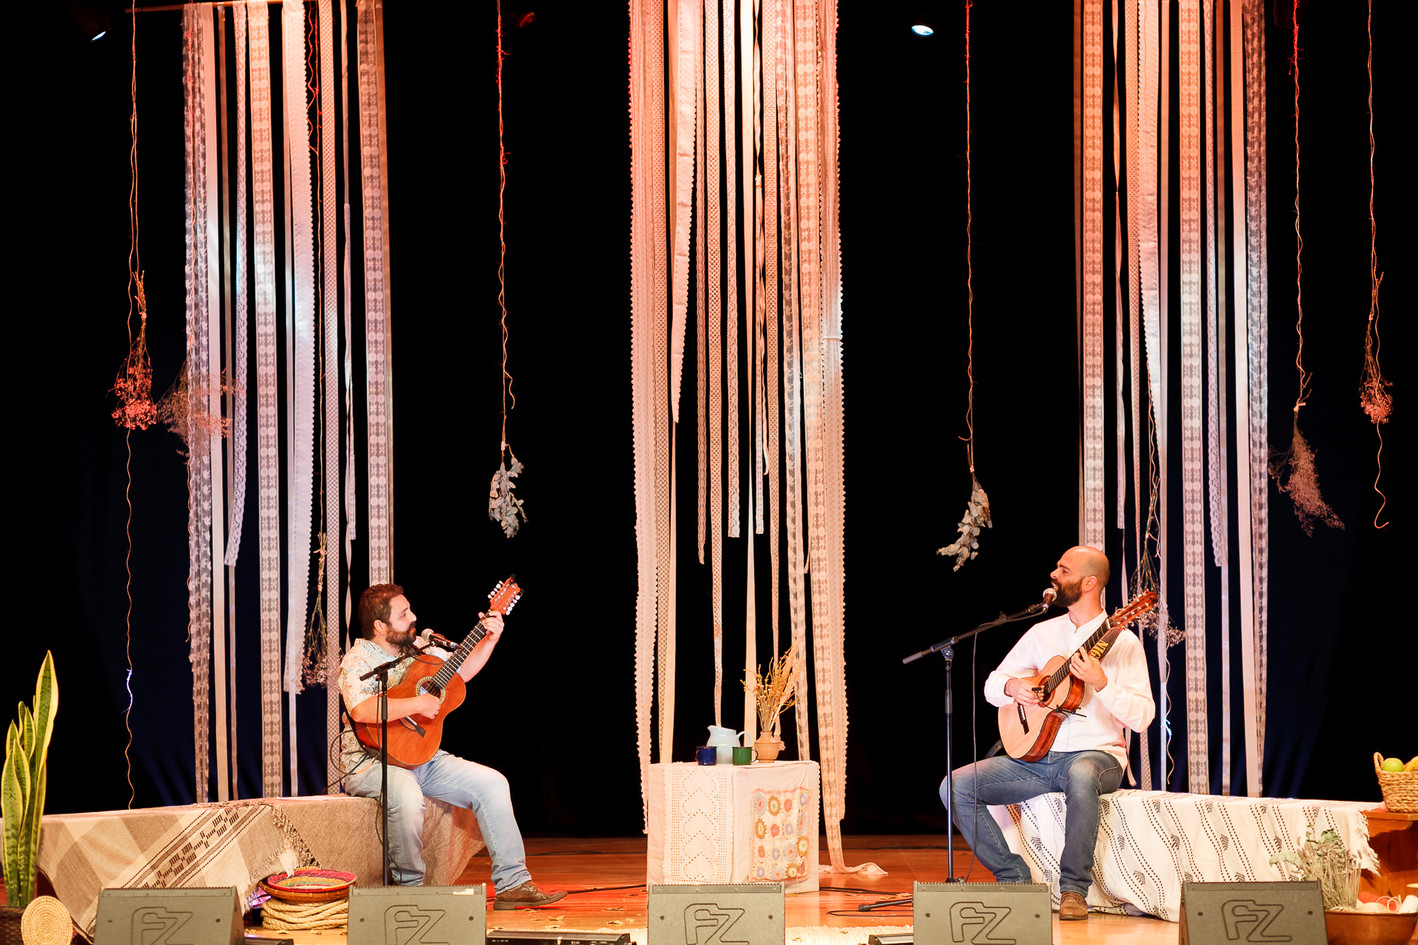 Festival_PenaBranca_Xavantinho_IMG_6522.